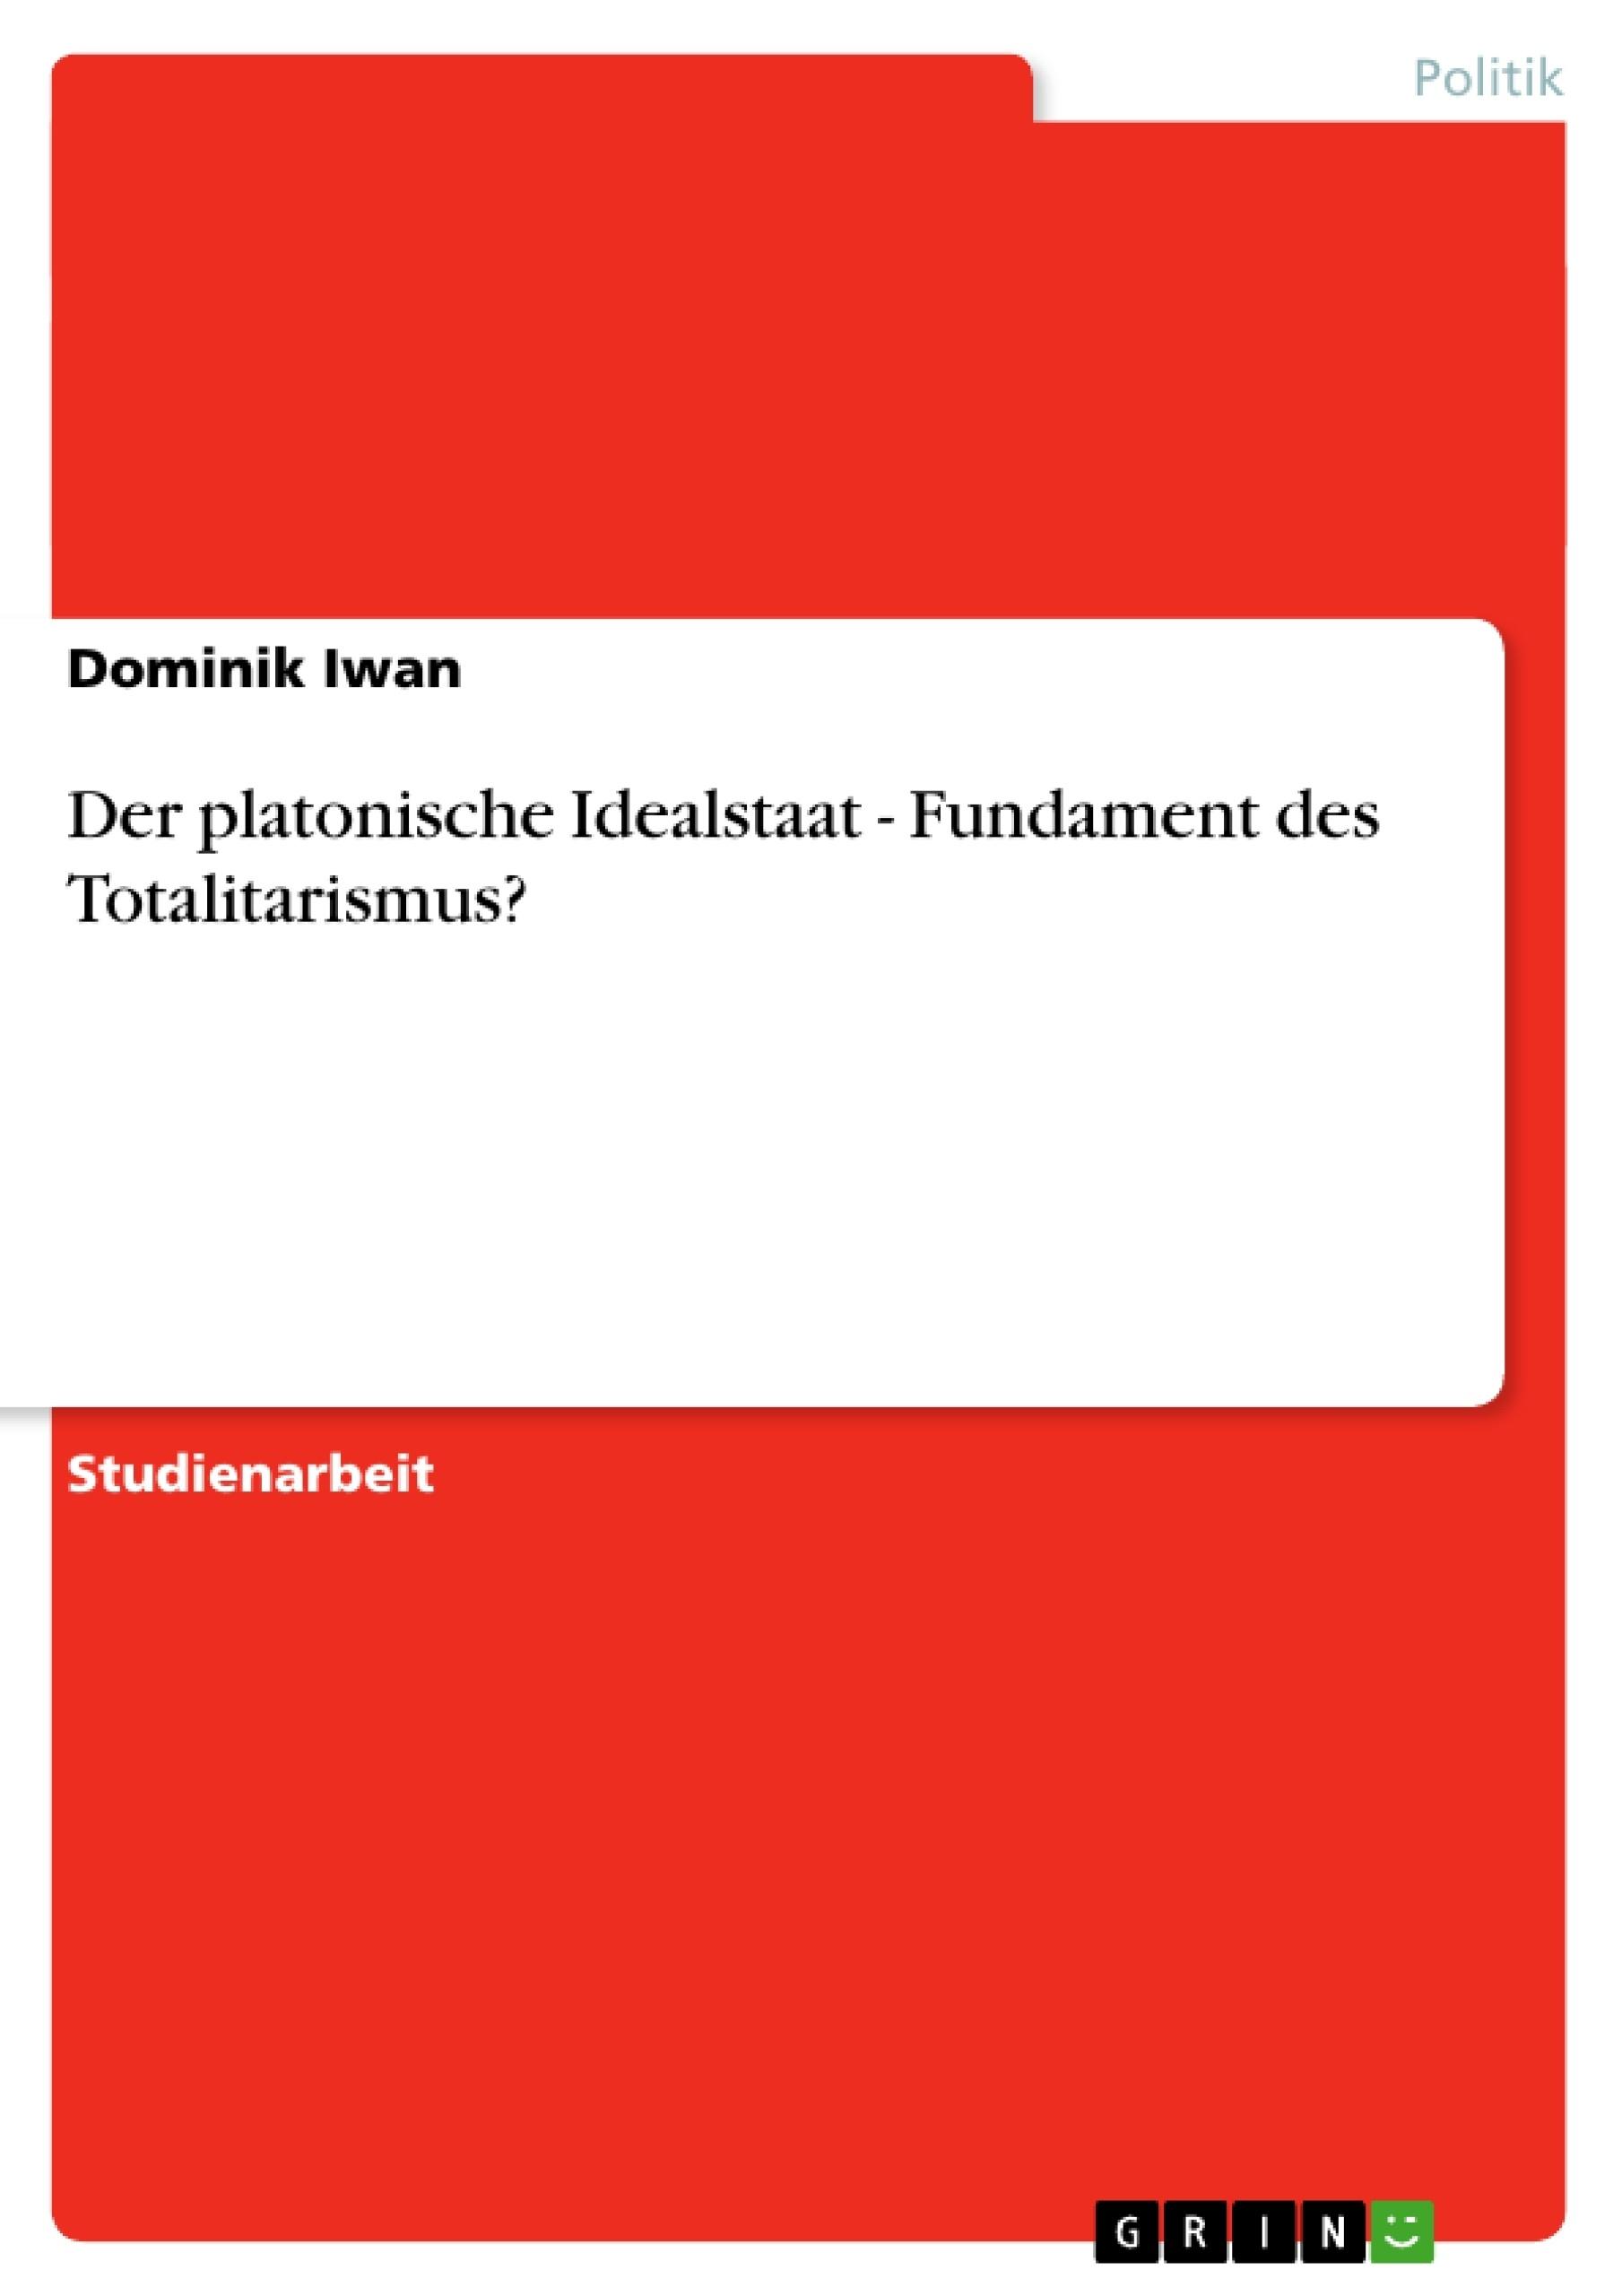 Titel: Der platonische Idealstaat - Fundament des Totalitarismus?